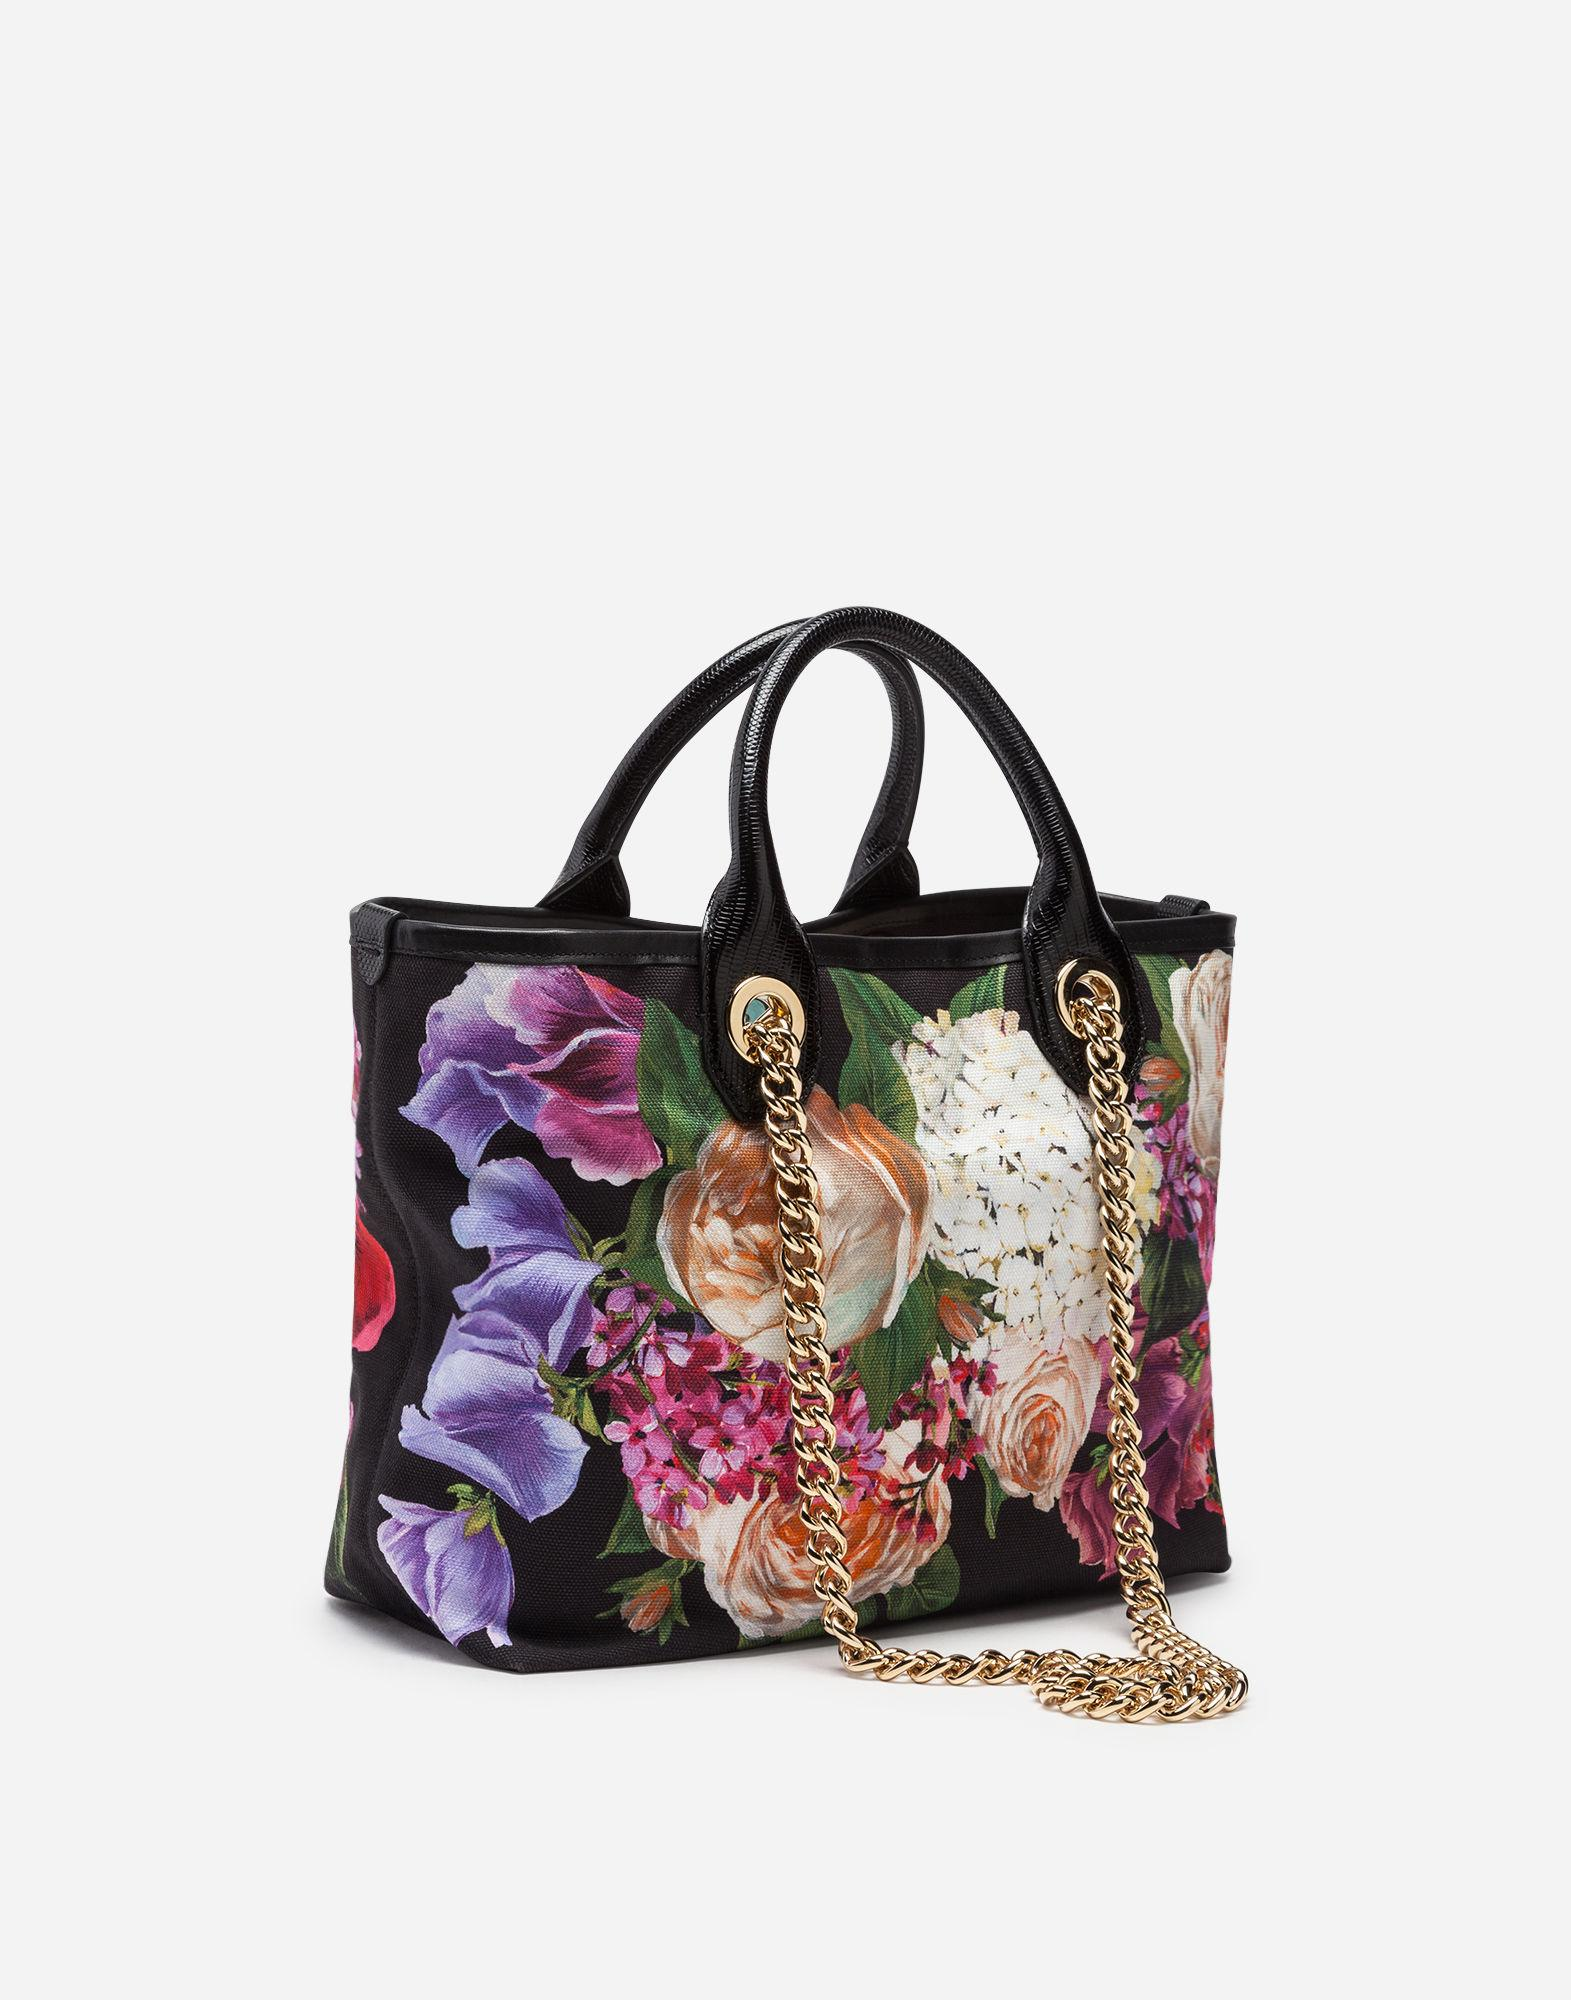 204b4621c0 Lyst - Dolce   Gabbana Capri Shopping Bag In Printed Canvas